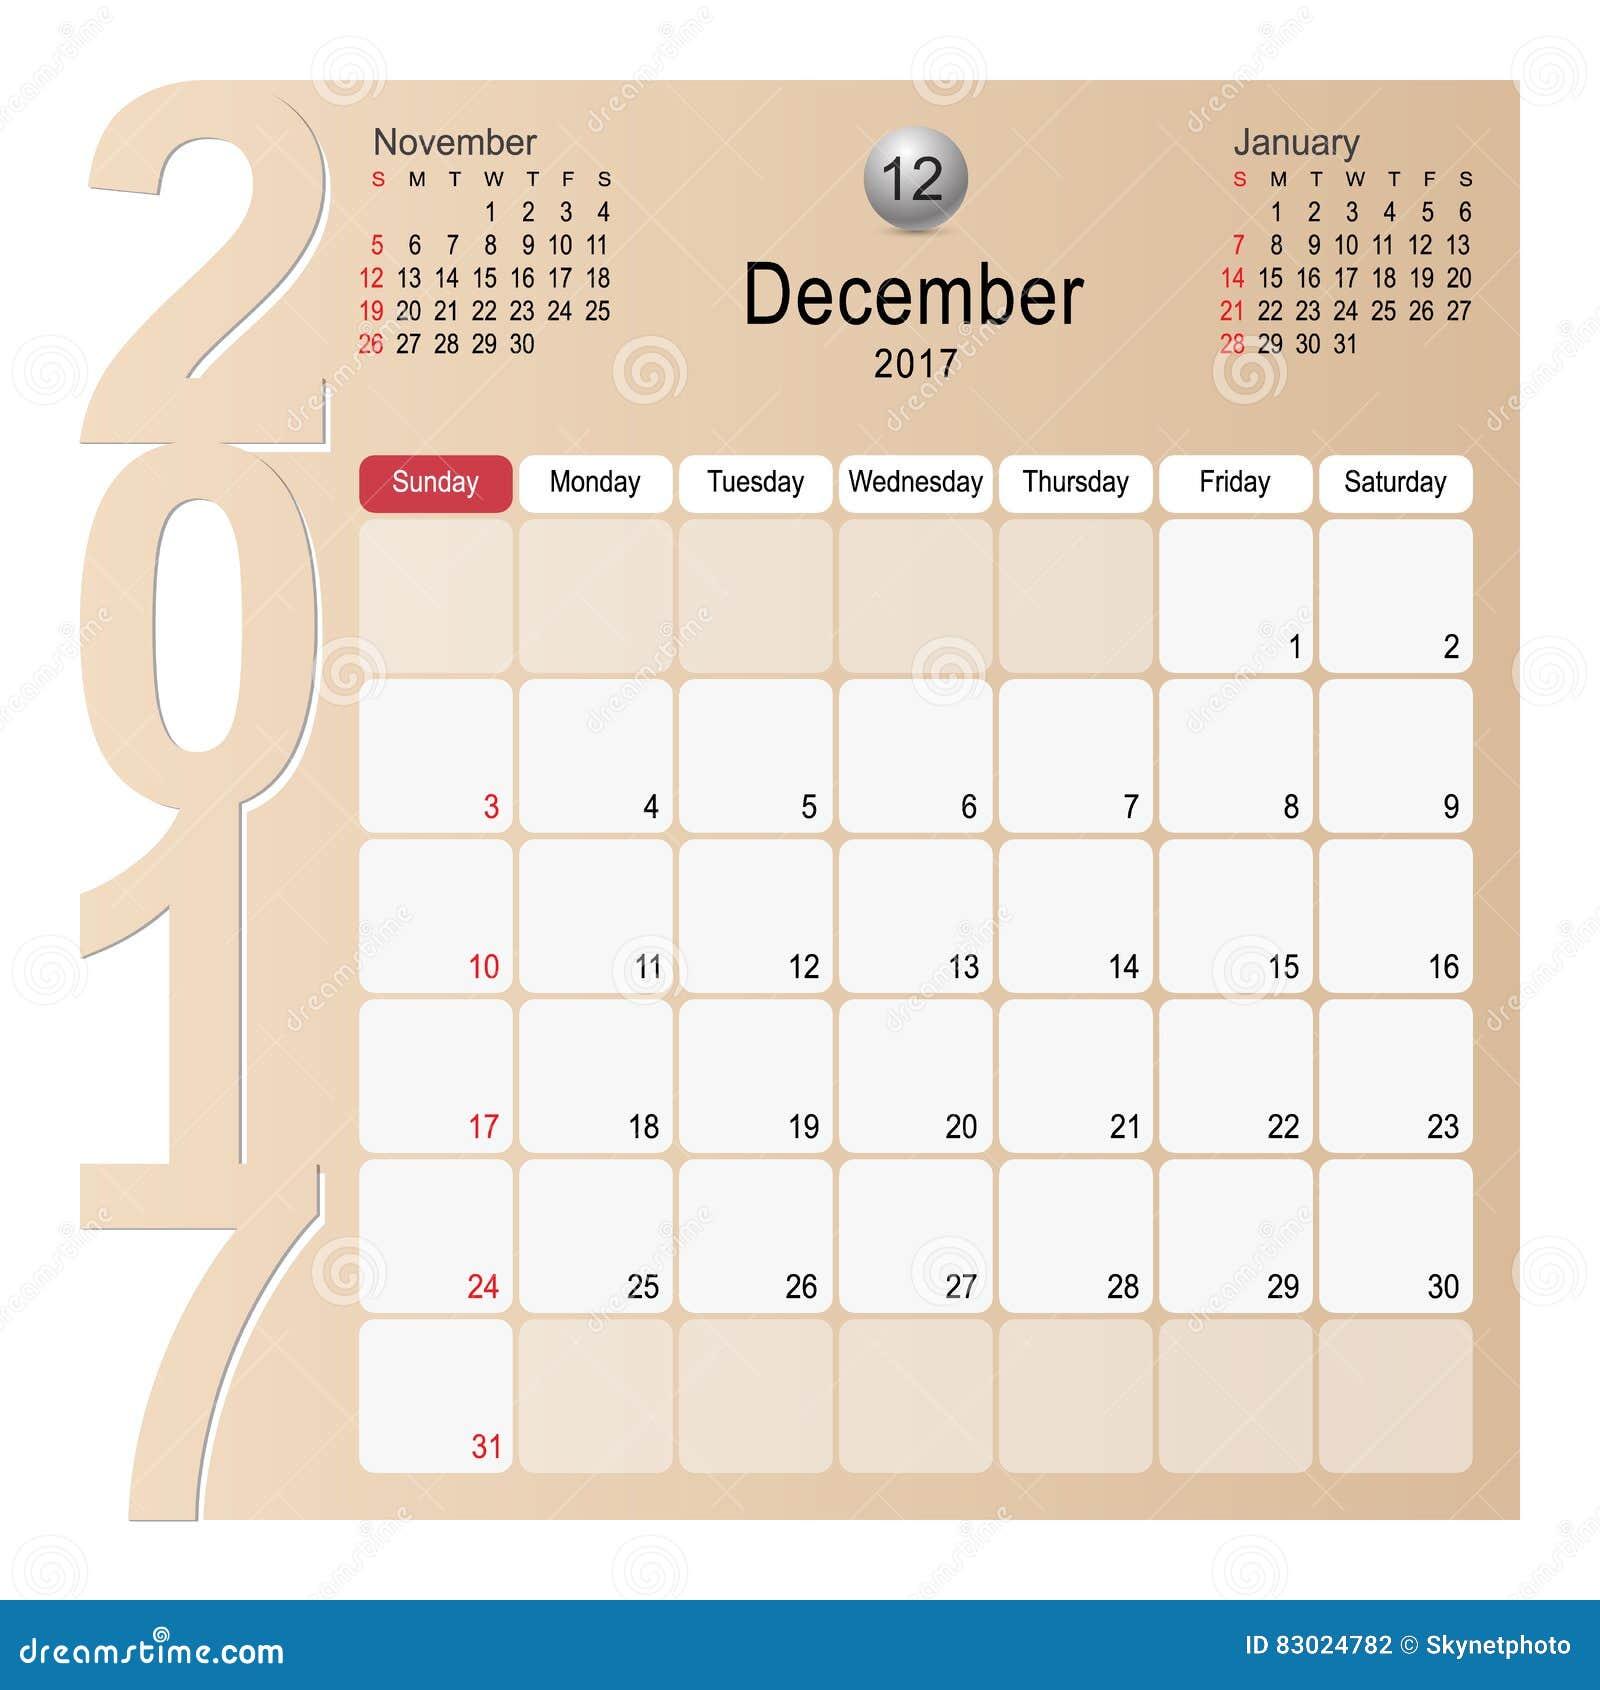 Calendar Planner Vector Free : Calendar planner design december stock vector image